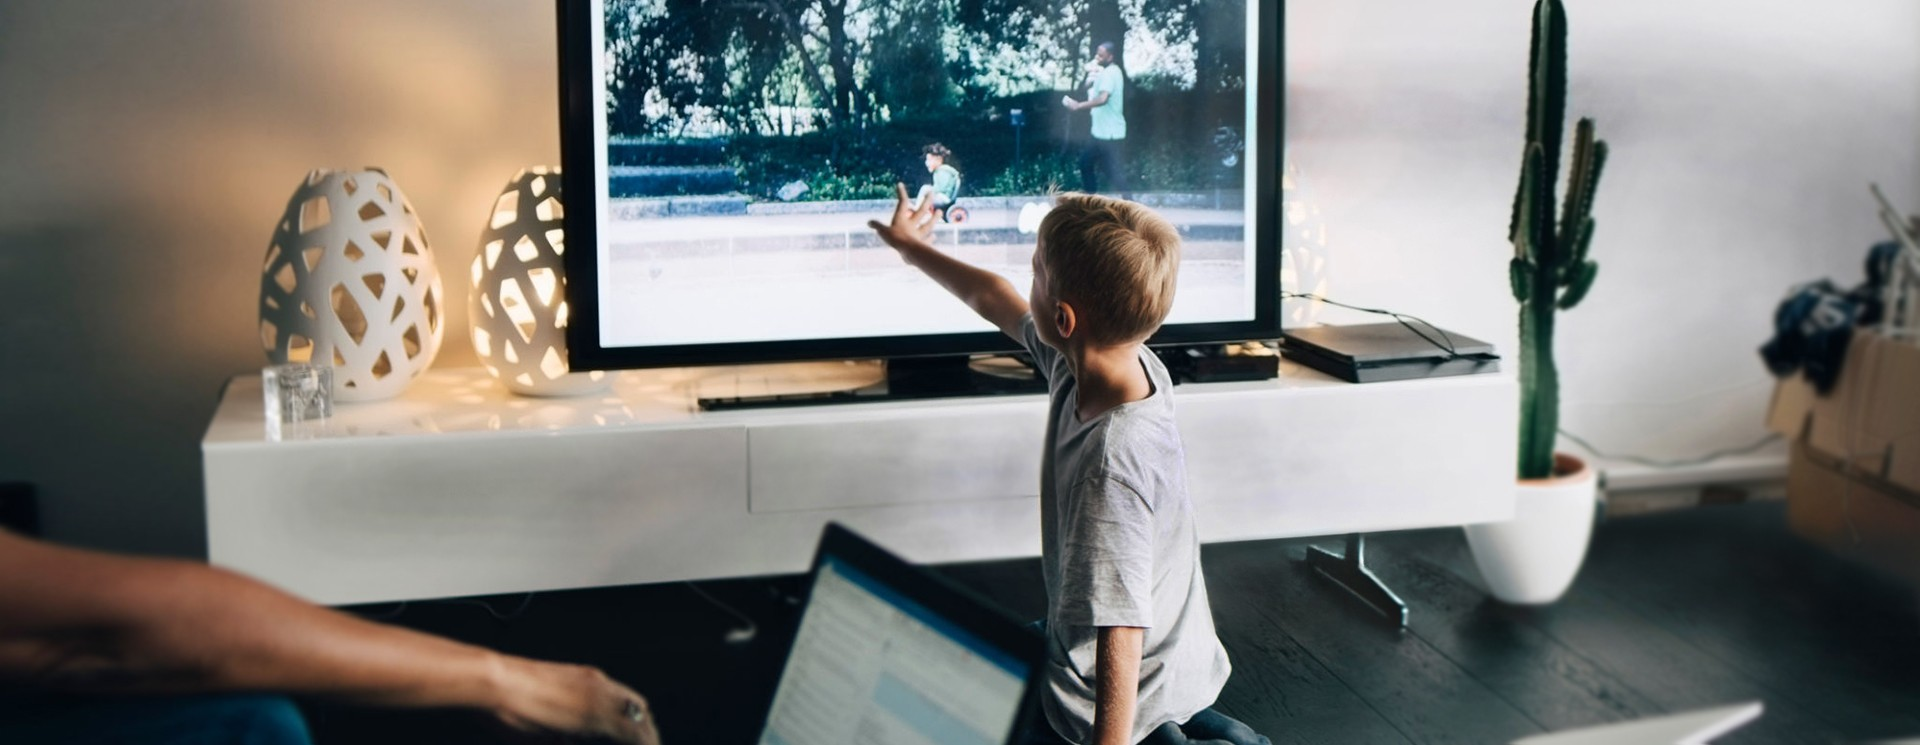 IVI - Watching Videos on Smart TVs image